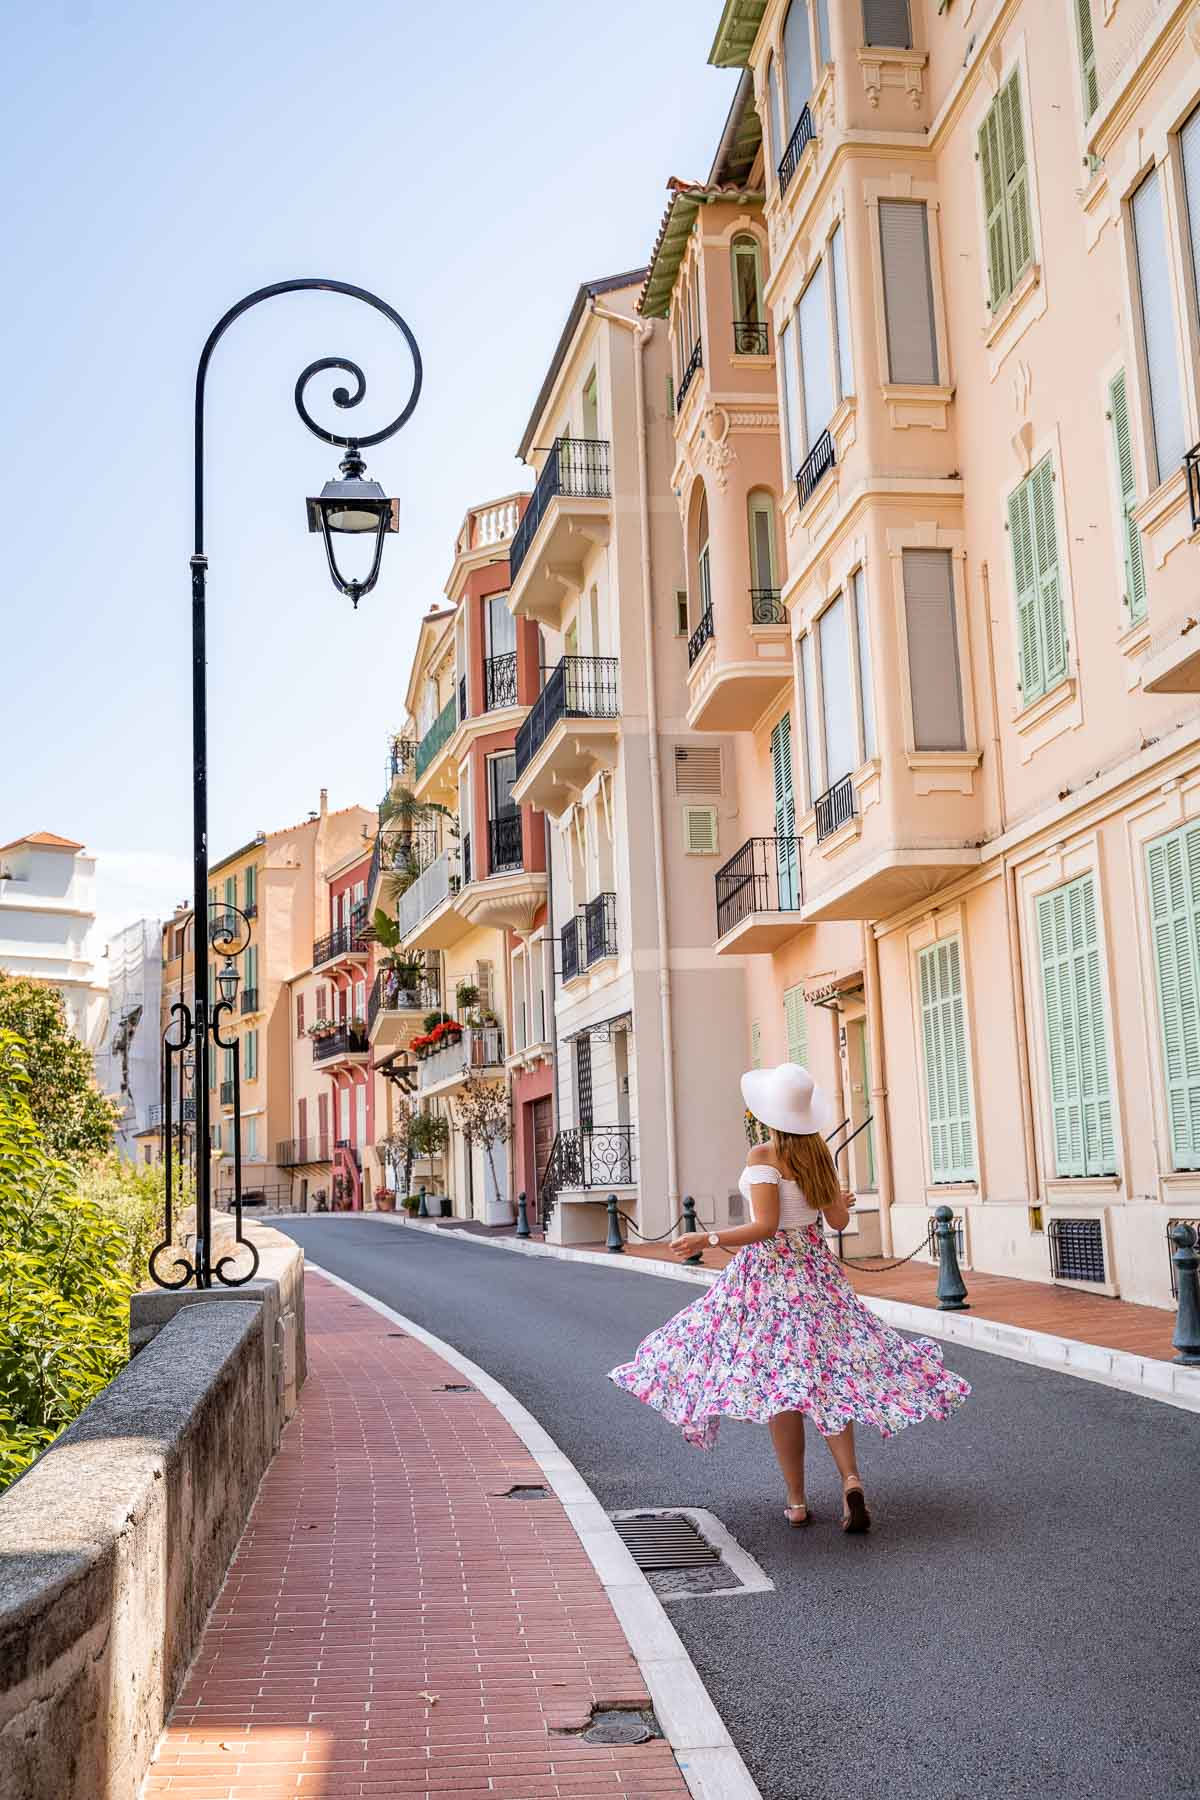 Pastel colored houses in Monaco